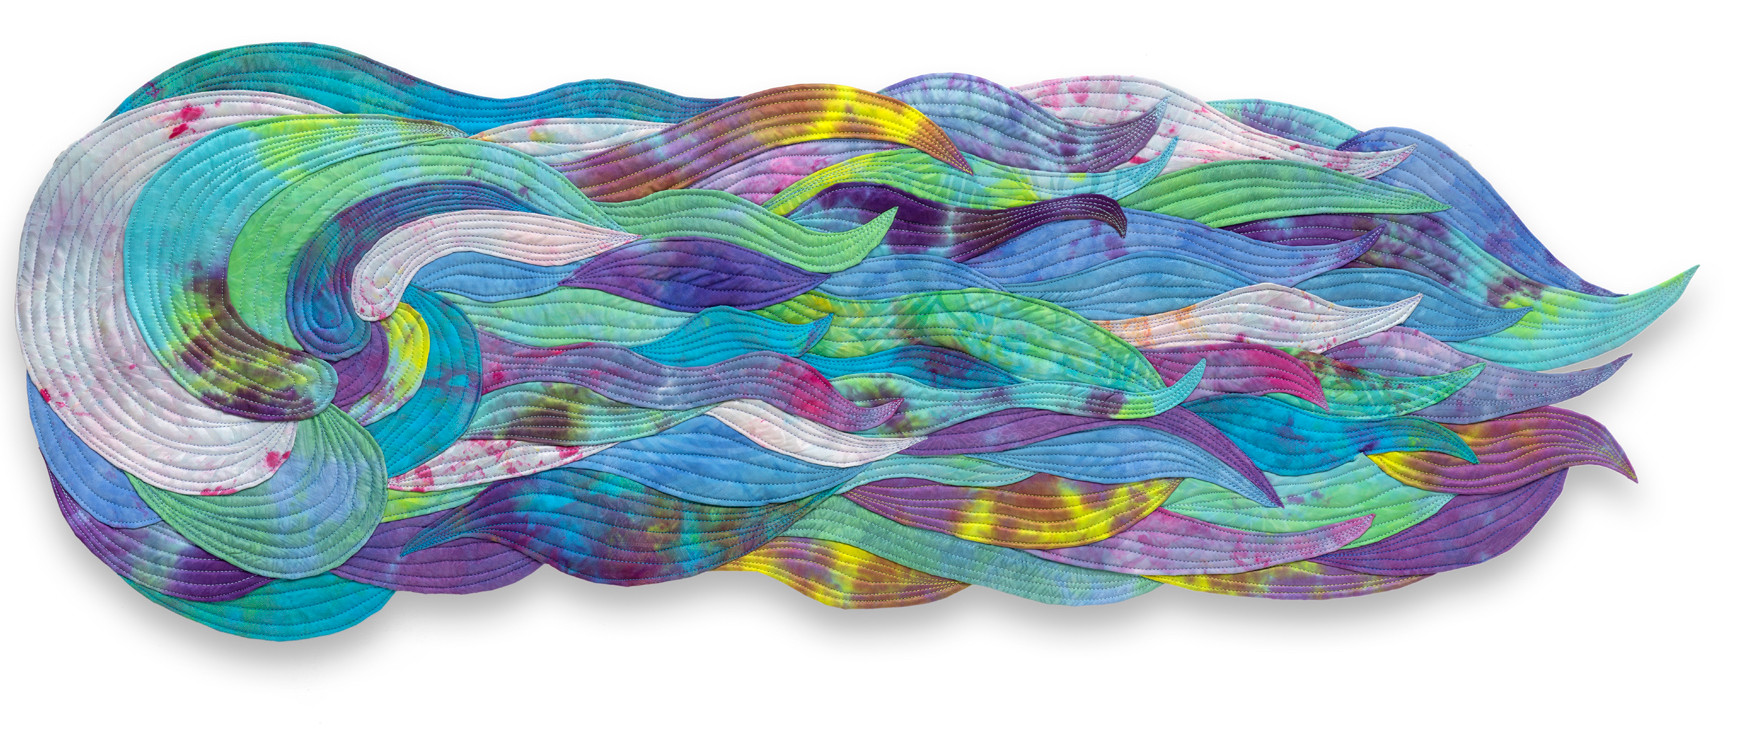 Sferra Waves_42.5x15.25.jpg